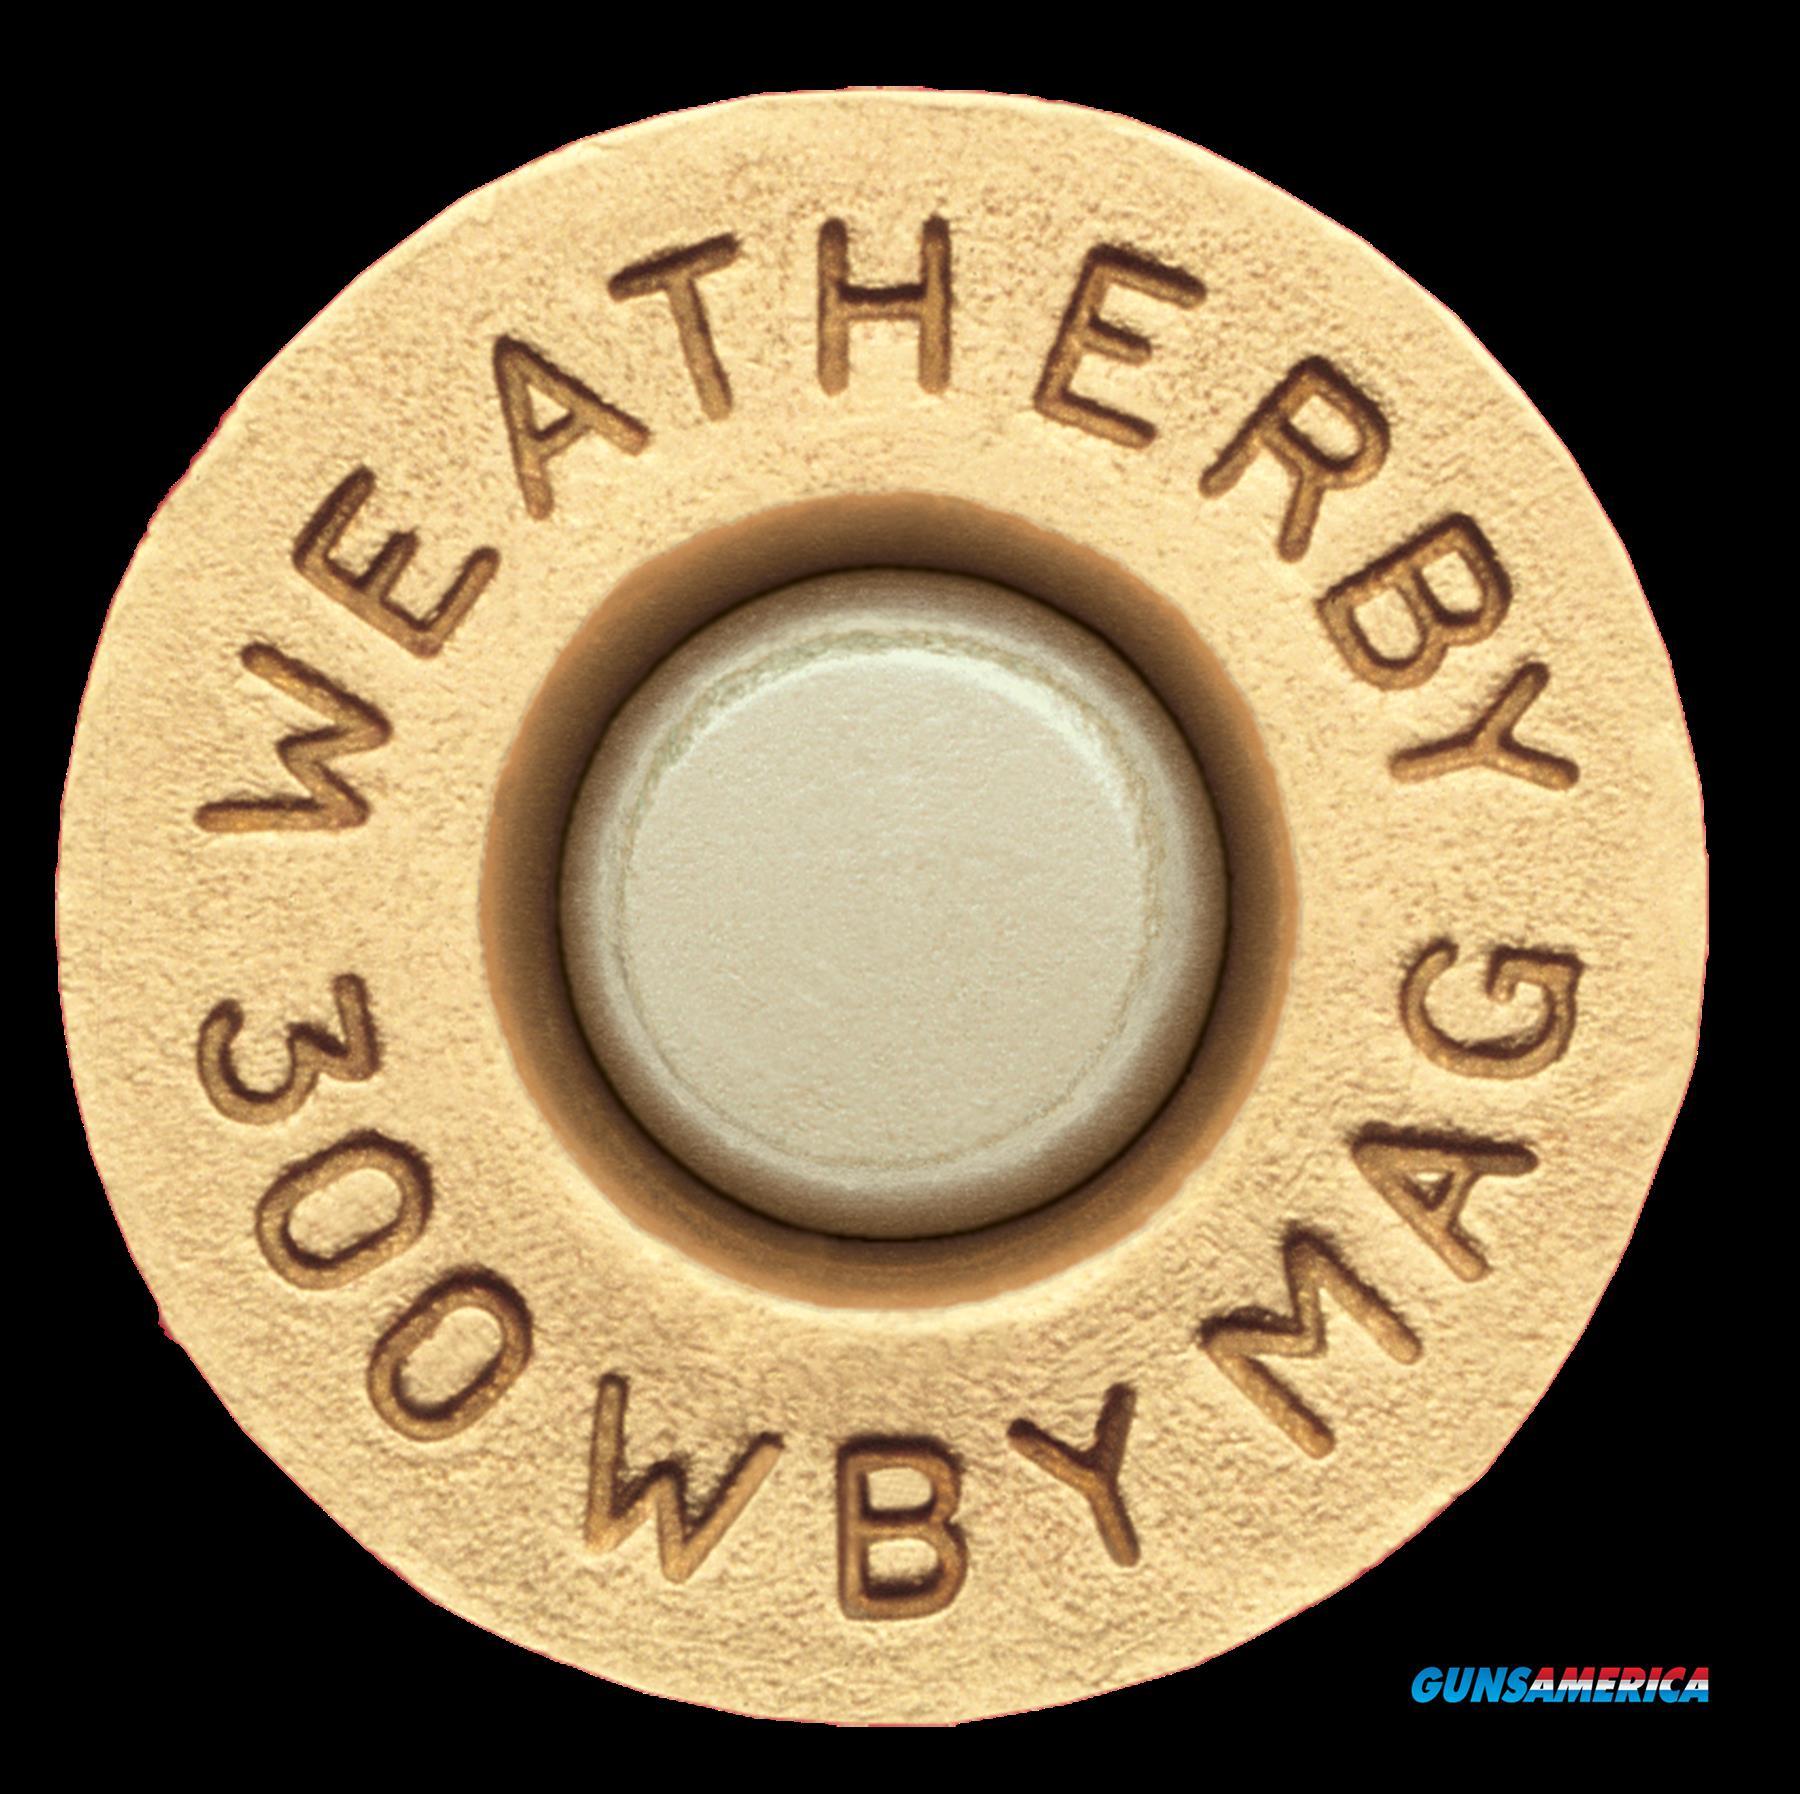 Weatherby Unprimed Brass, Wthby Brass300  Up Brass 300wby    20  Guns > Pistols > 1911 Pistol Copies (non-Colt)